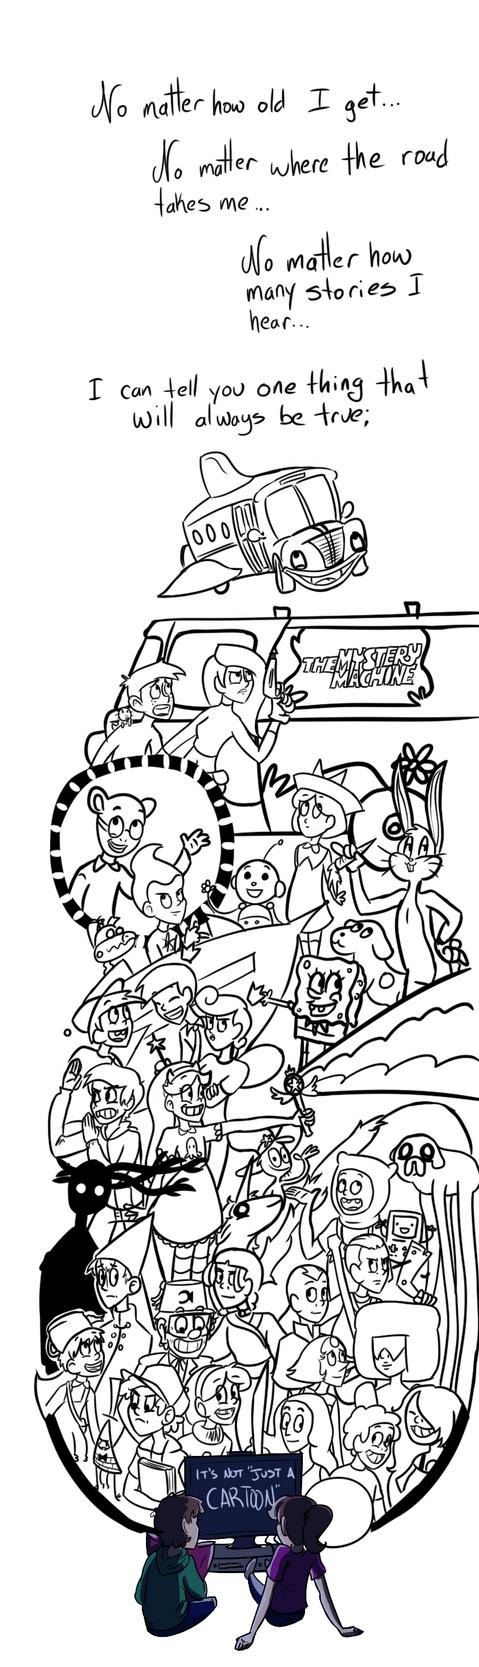 Not Just A Cartoon by Geli-K